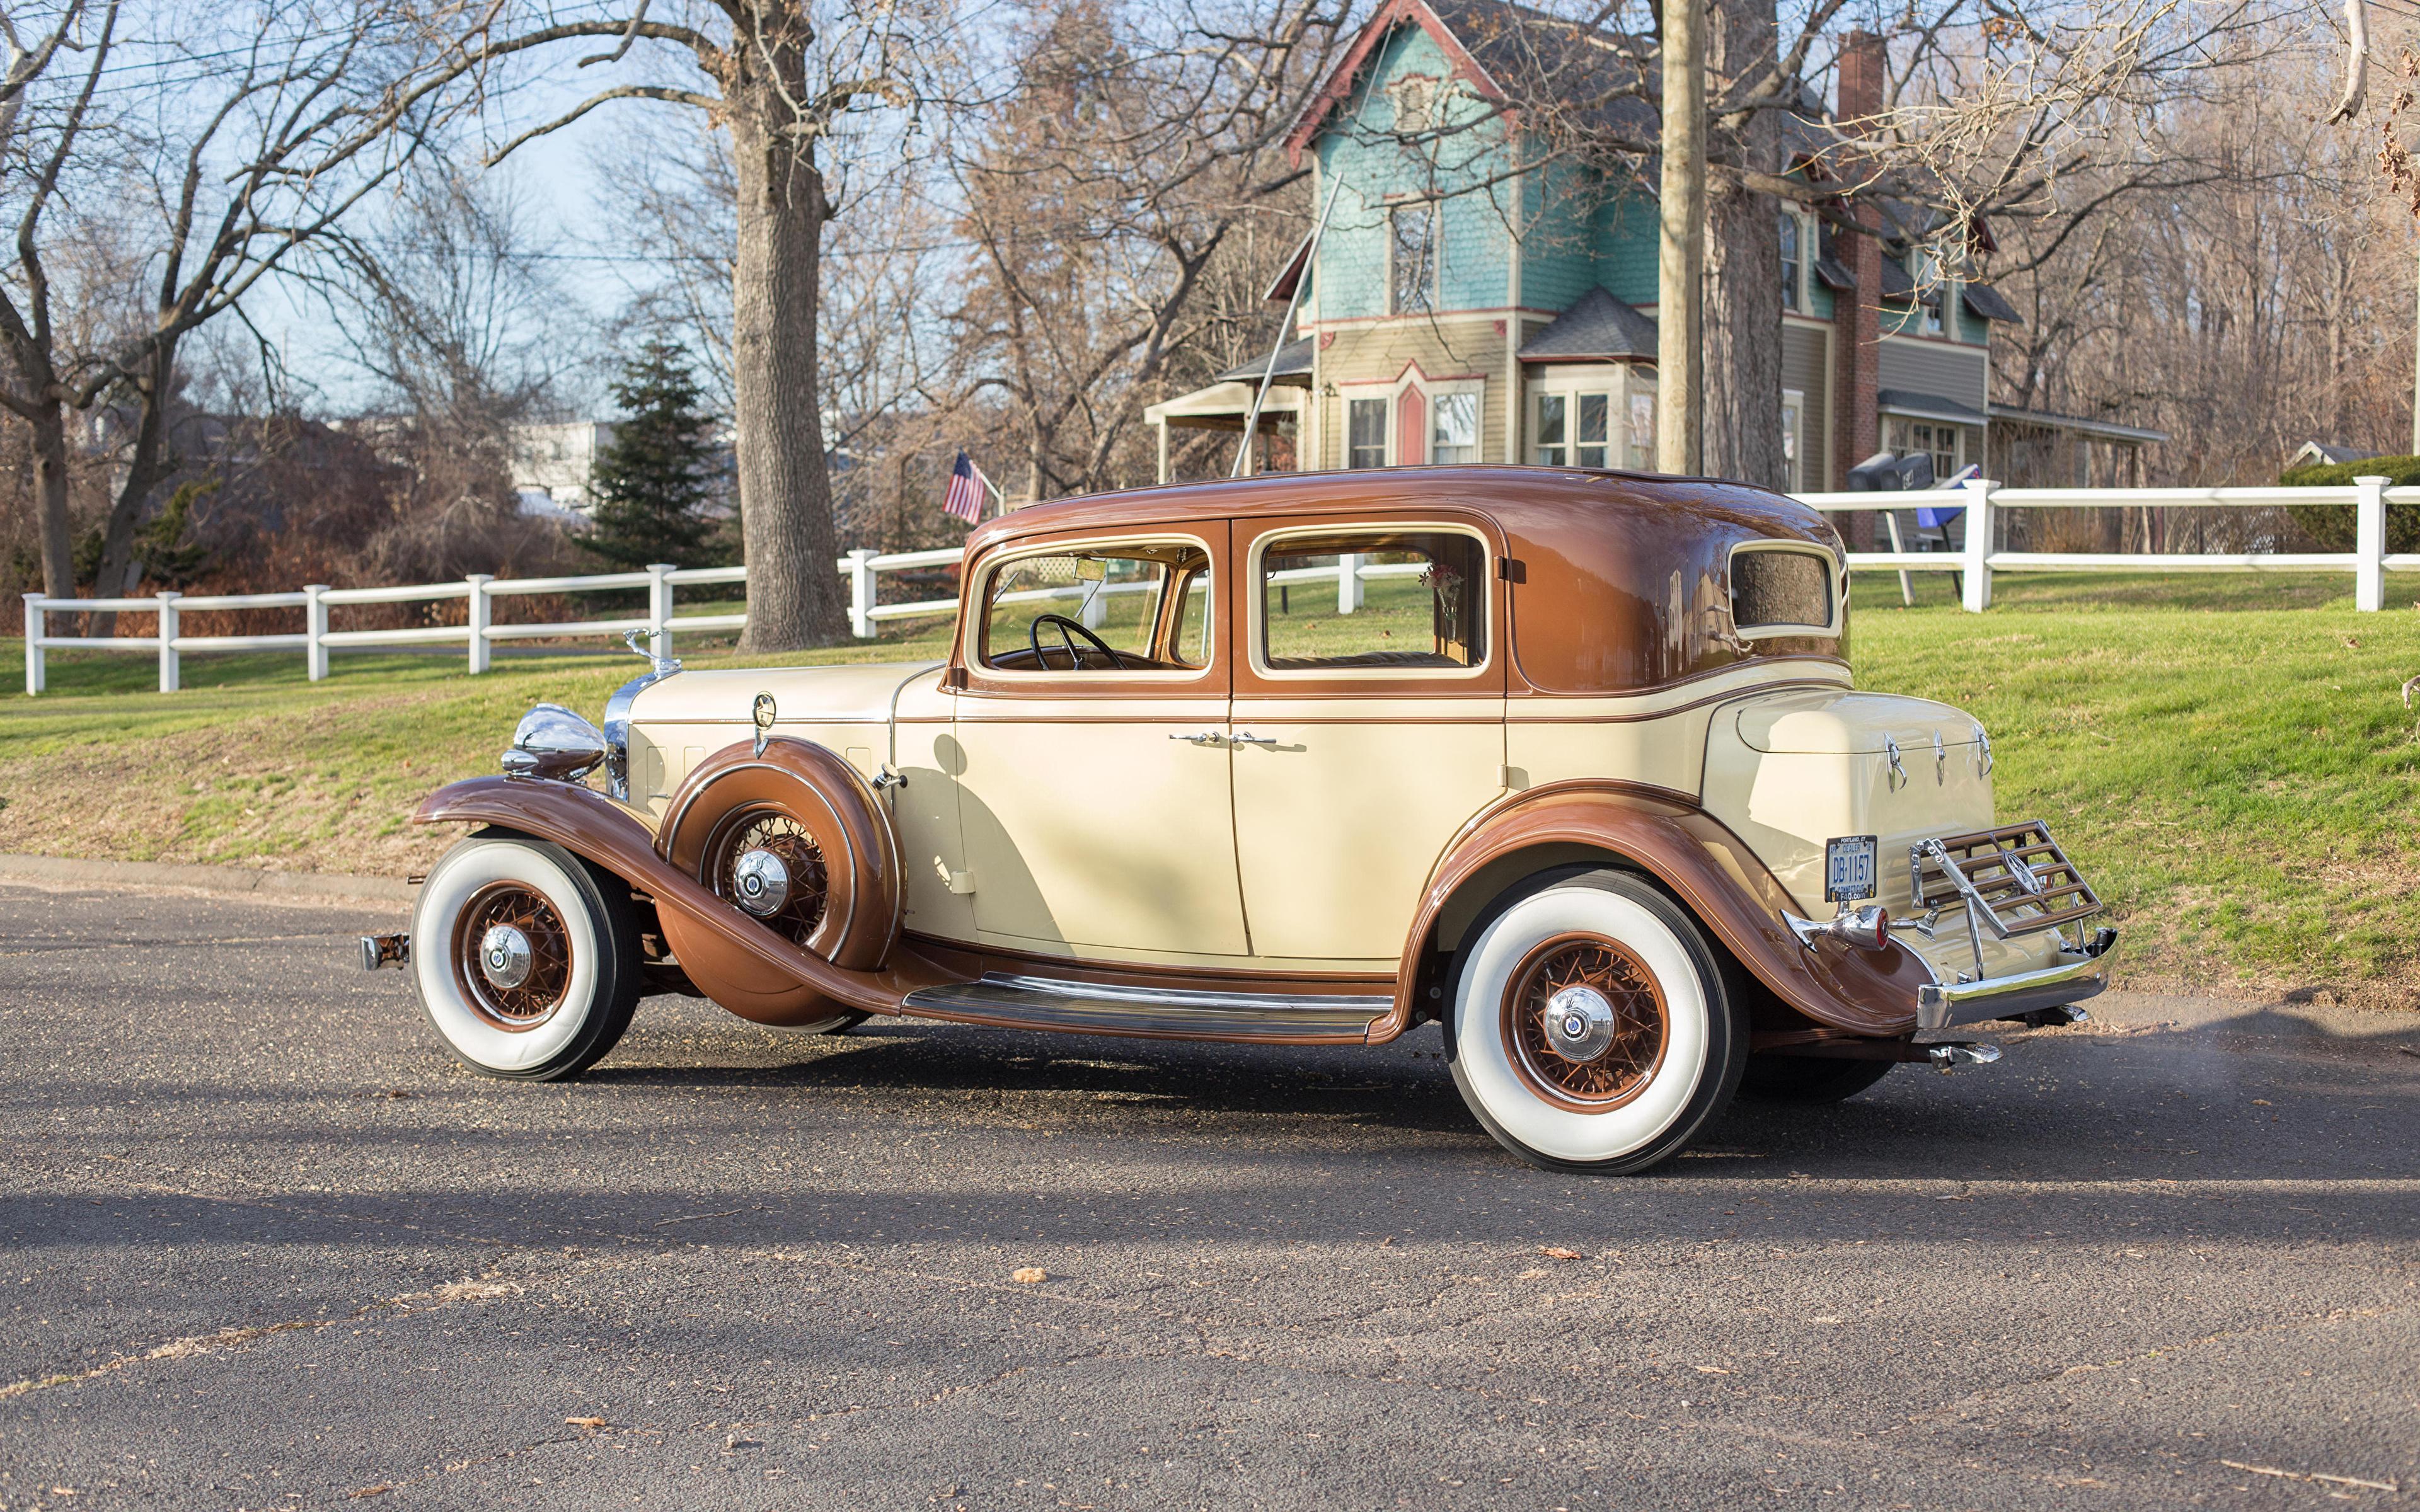 Картинка Cadillac 1932 V12 370-B Town Sedan by Fisher Сбоку Автомобили 3840x2400 Кадиллак авто машины машина автомобиль